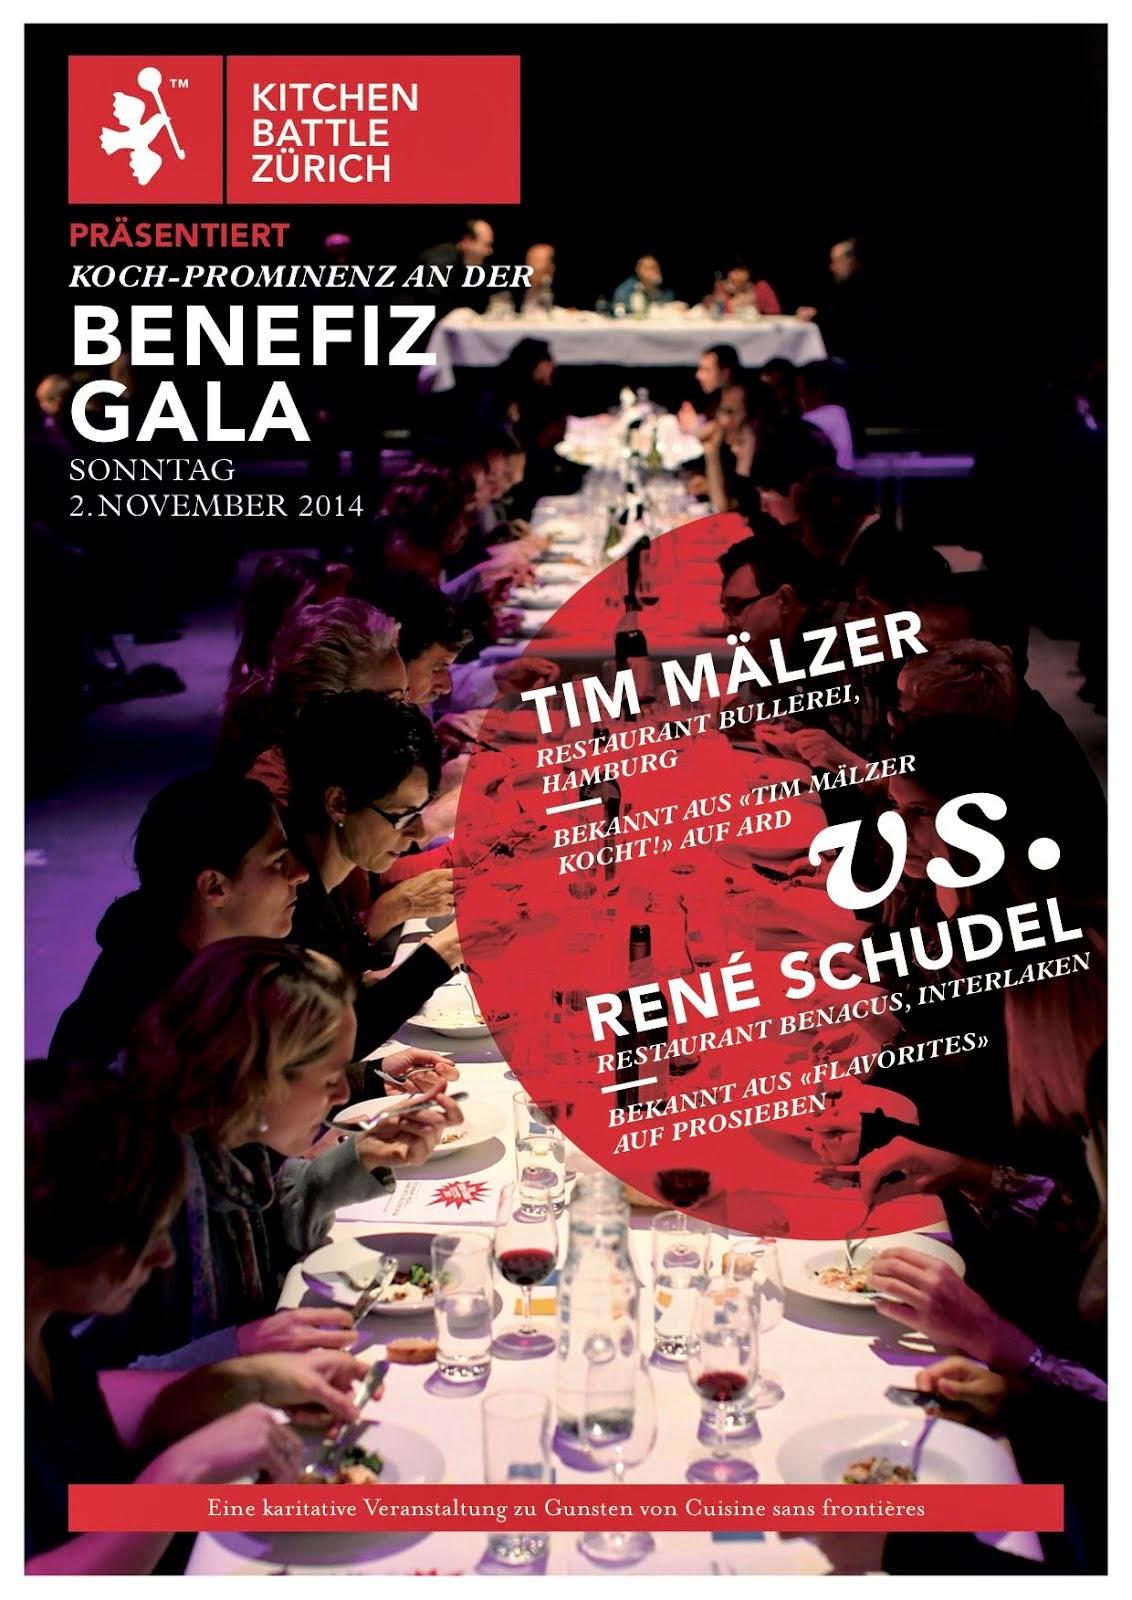 Benefiz Gala mit René Schudel vs. Tim Mälzer